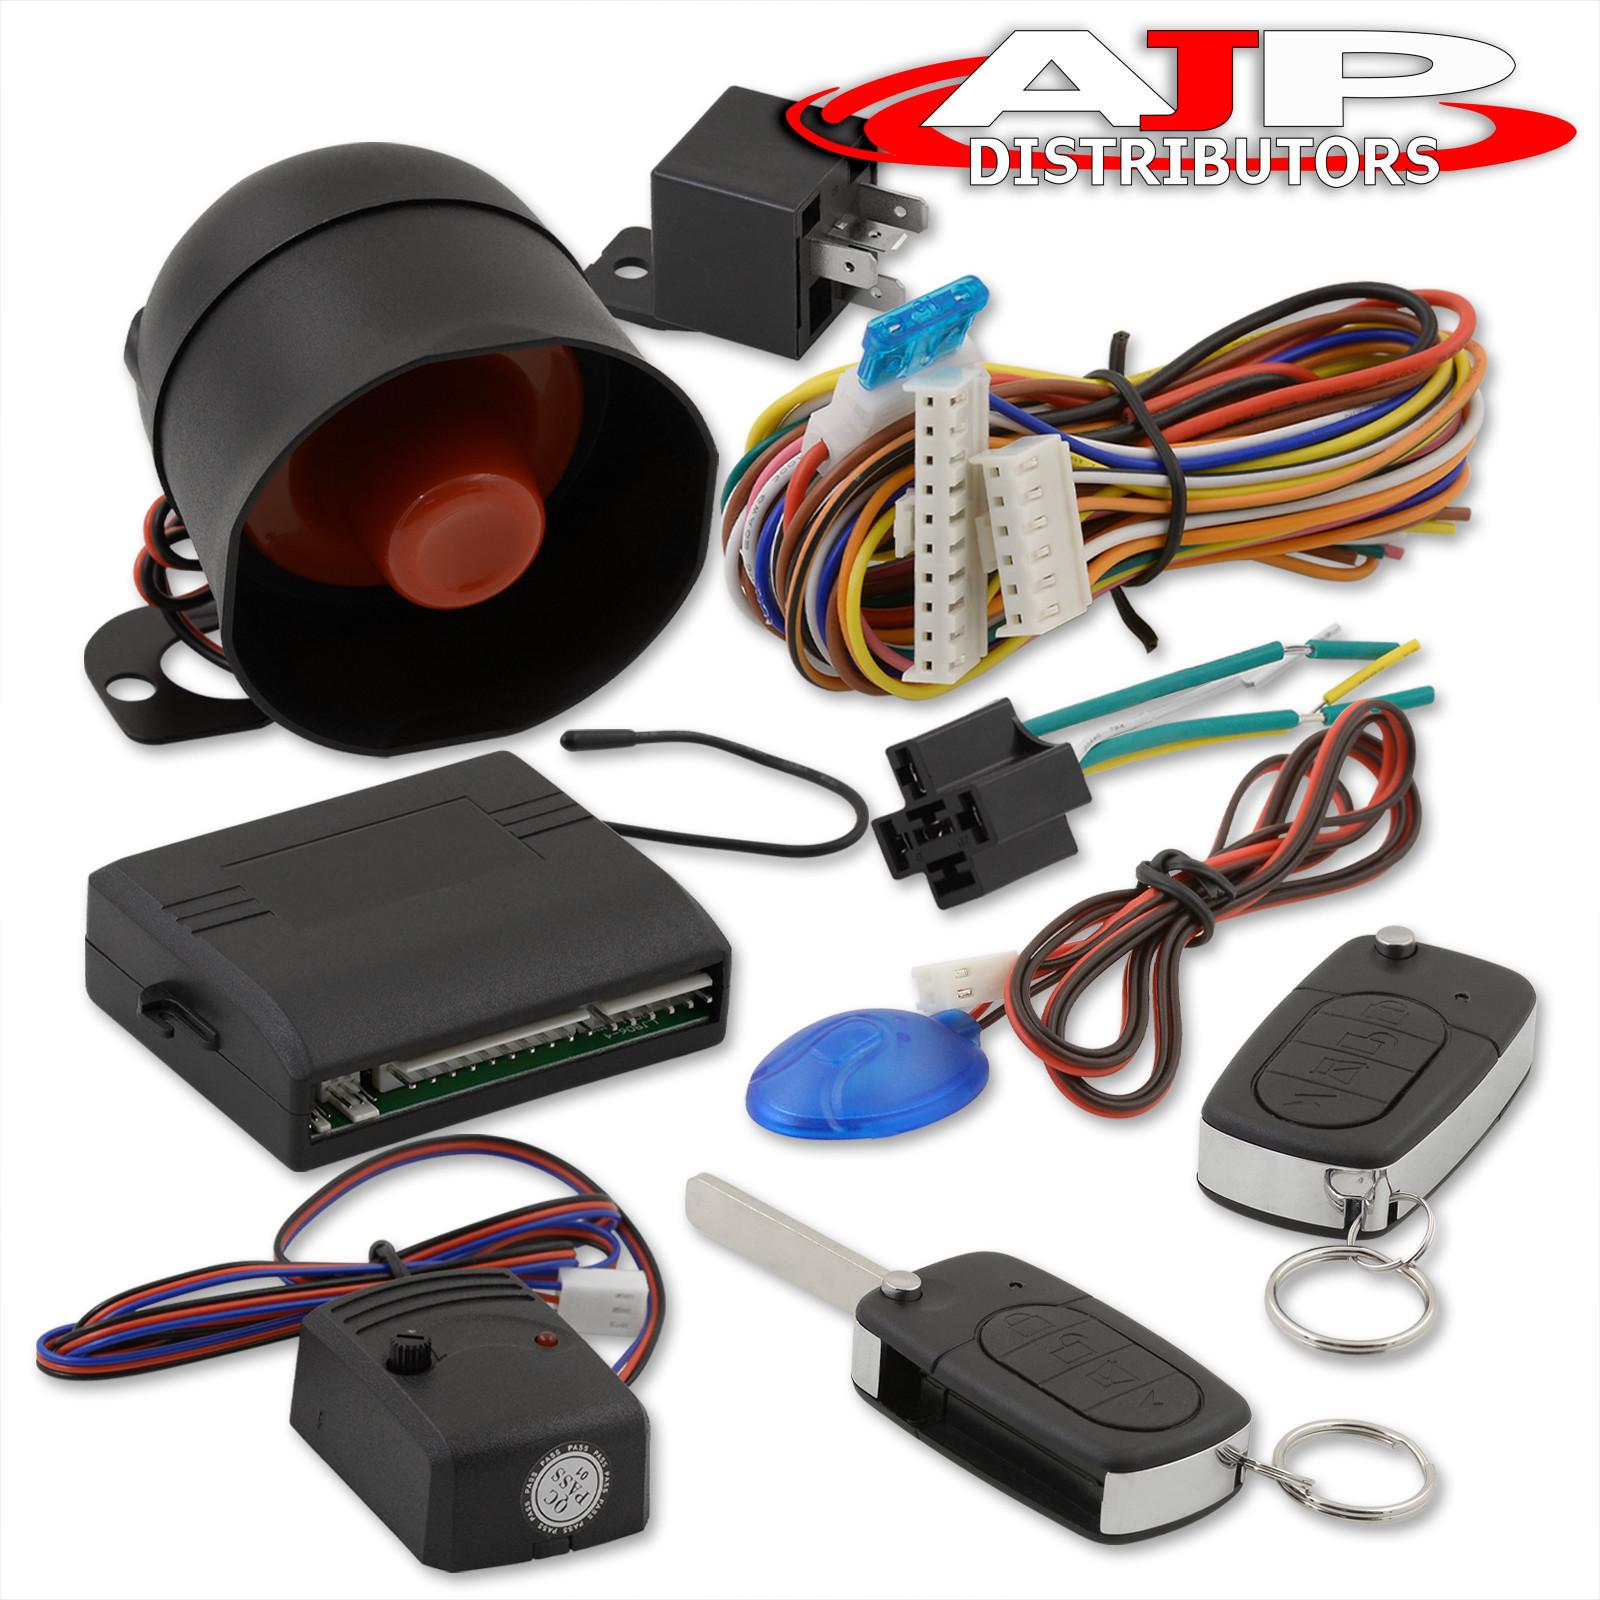 Jdm Car Alarm Security System Remote Transmitters With Flip Keys For Central Locking Wiring Diagram All Honda